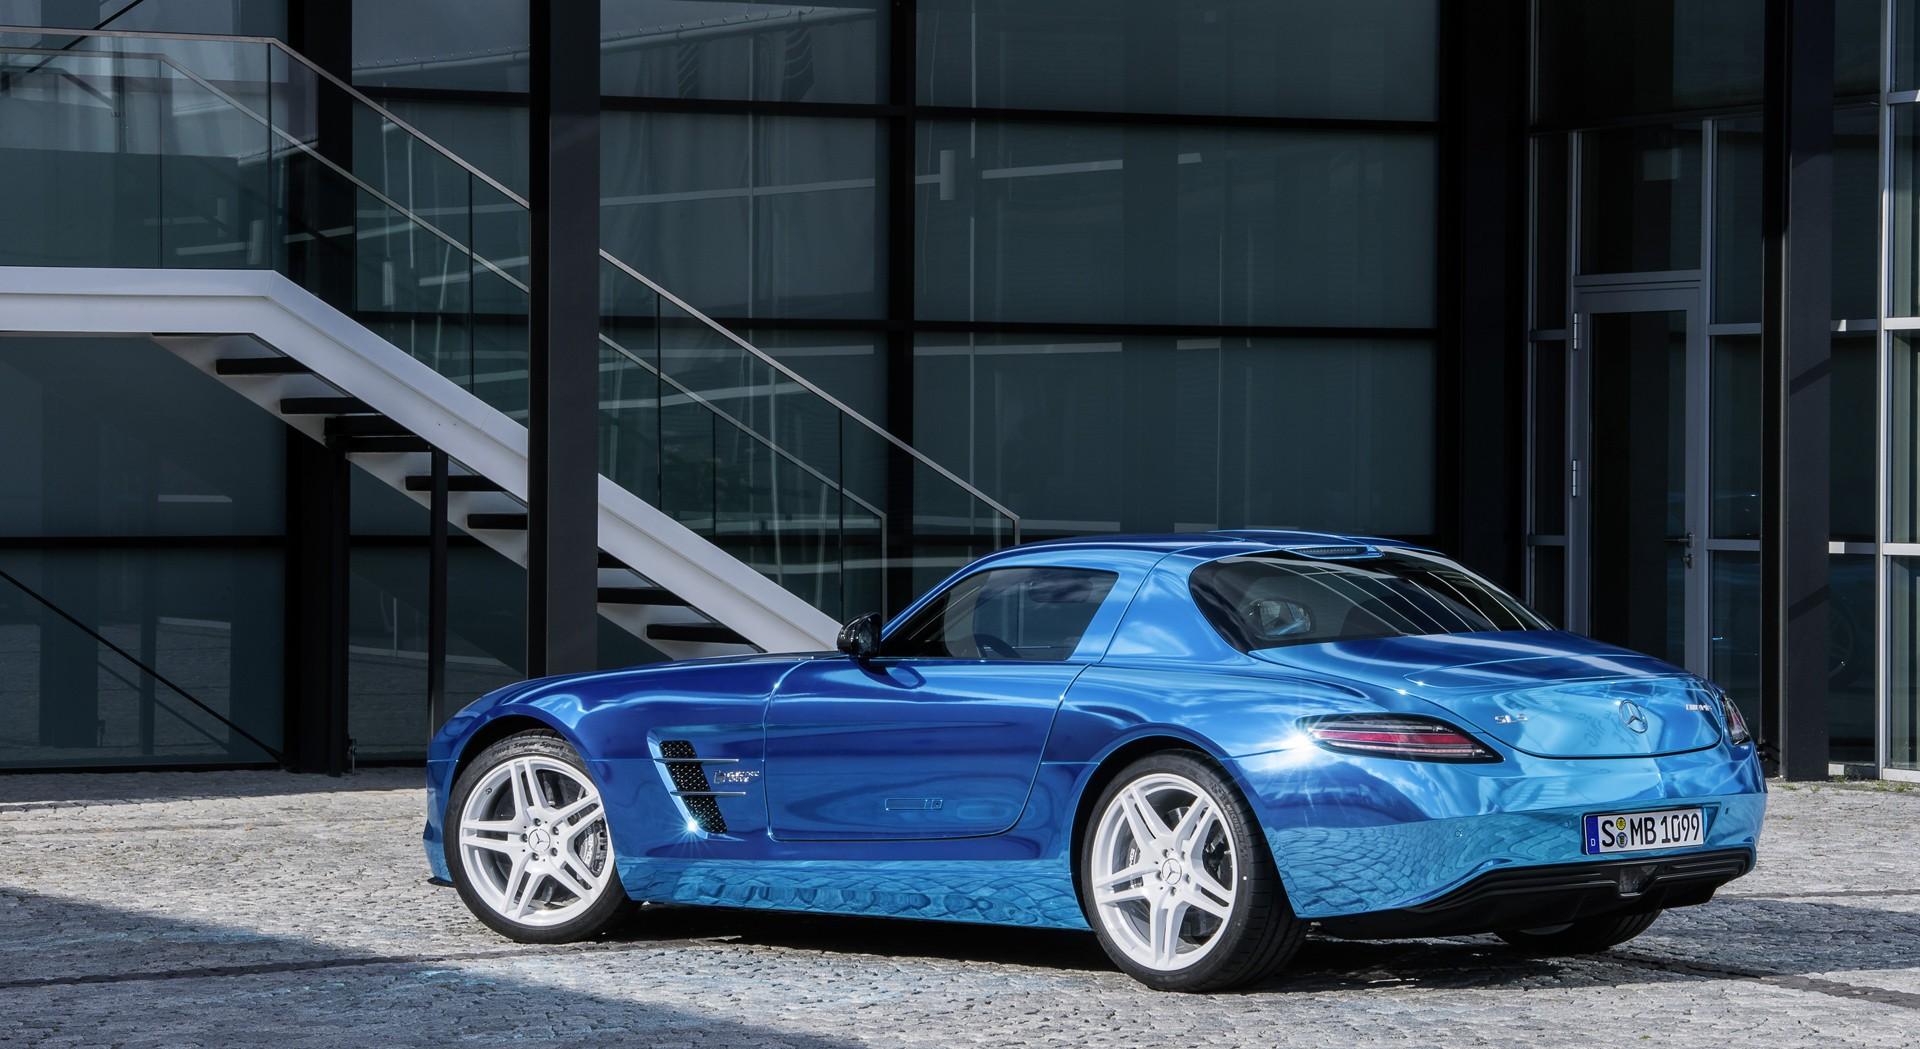 Mercedes benz sls amg blue back hd desktop wallpapers for Blue mercedes benz